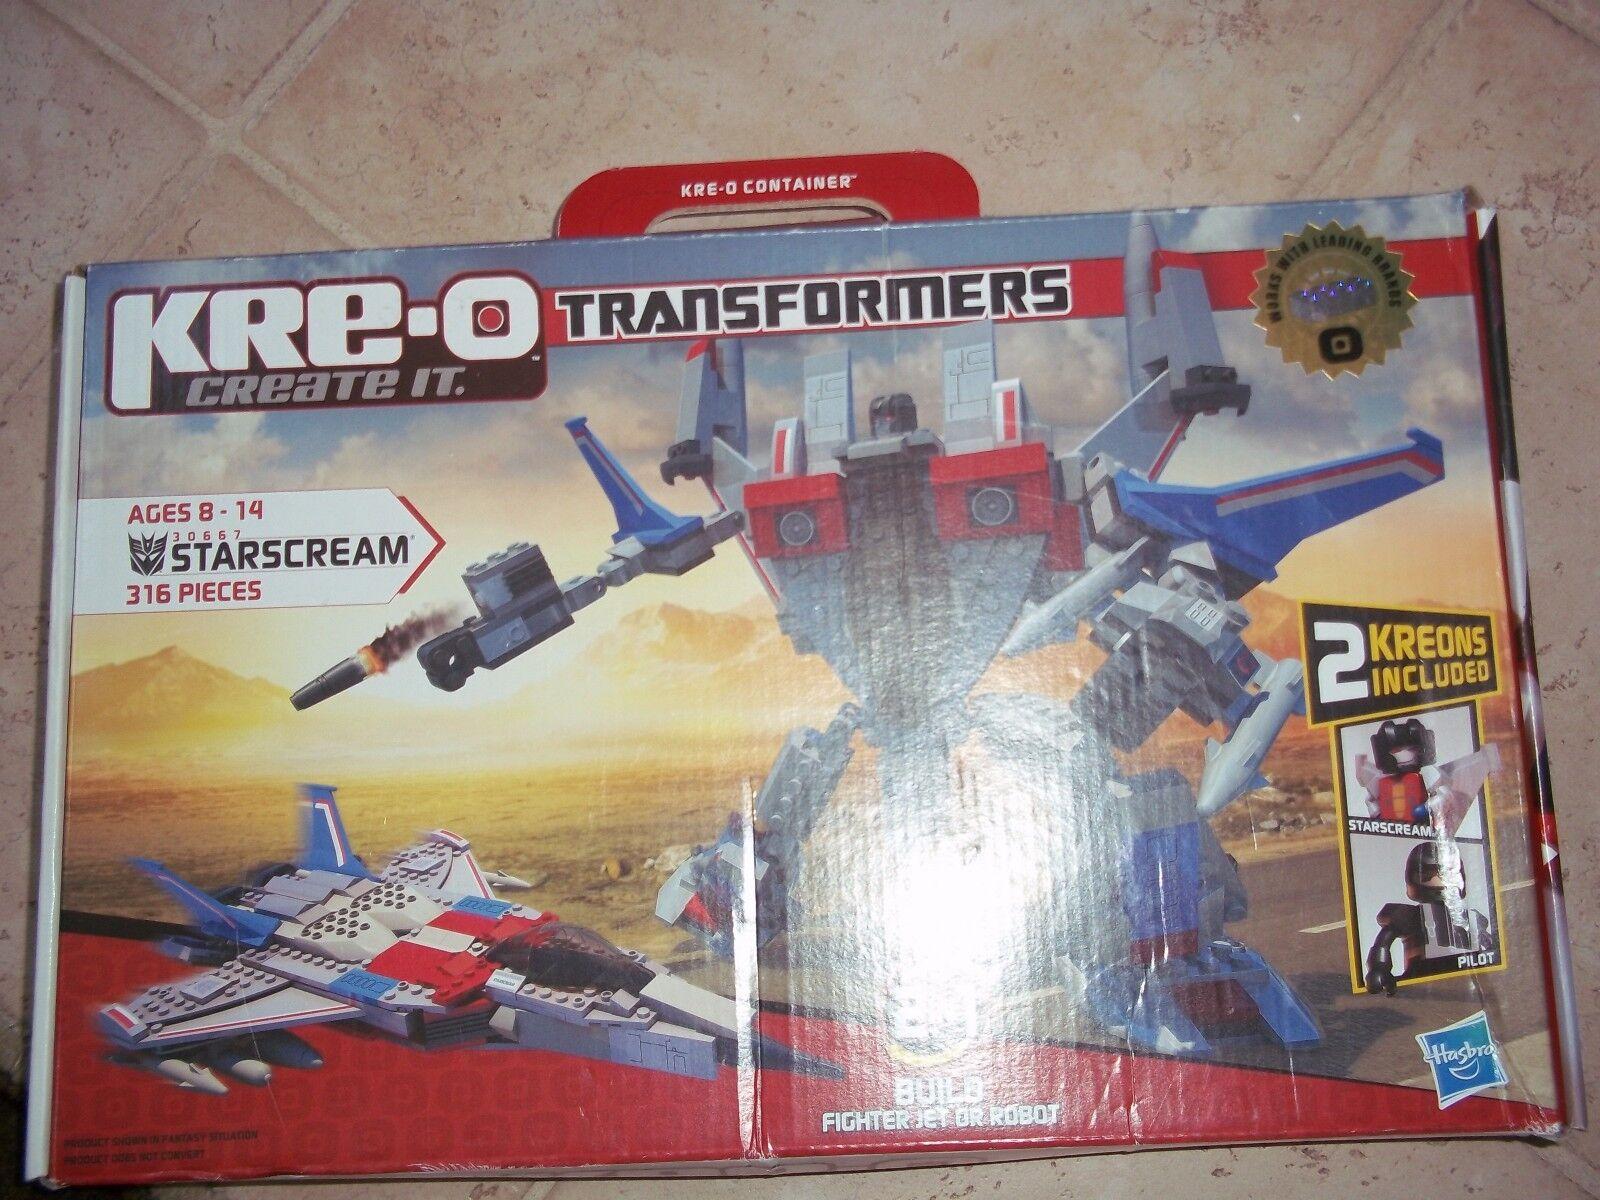 New Hasbro KRE-O Transformers Starscream Building Set 30667 w/2 Kreons + Pilot